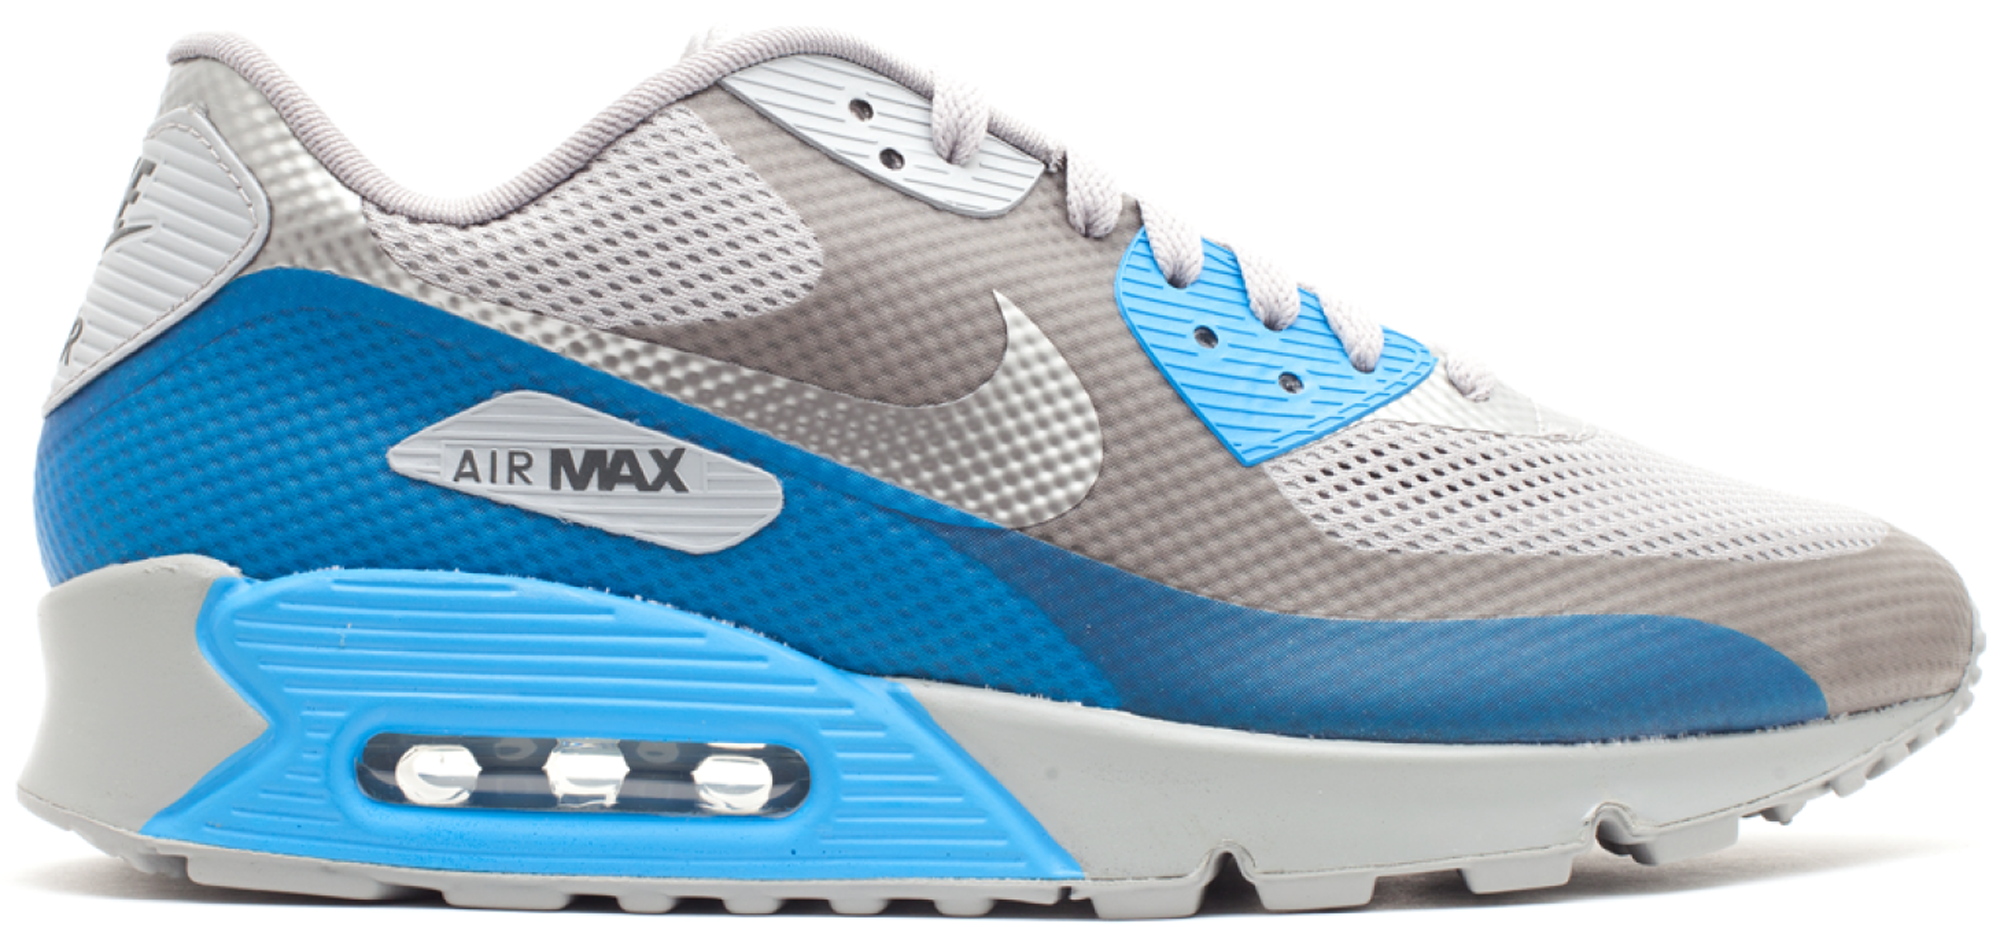 Nike Air Max 90 Hyperfuse Midnight Fog